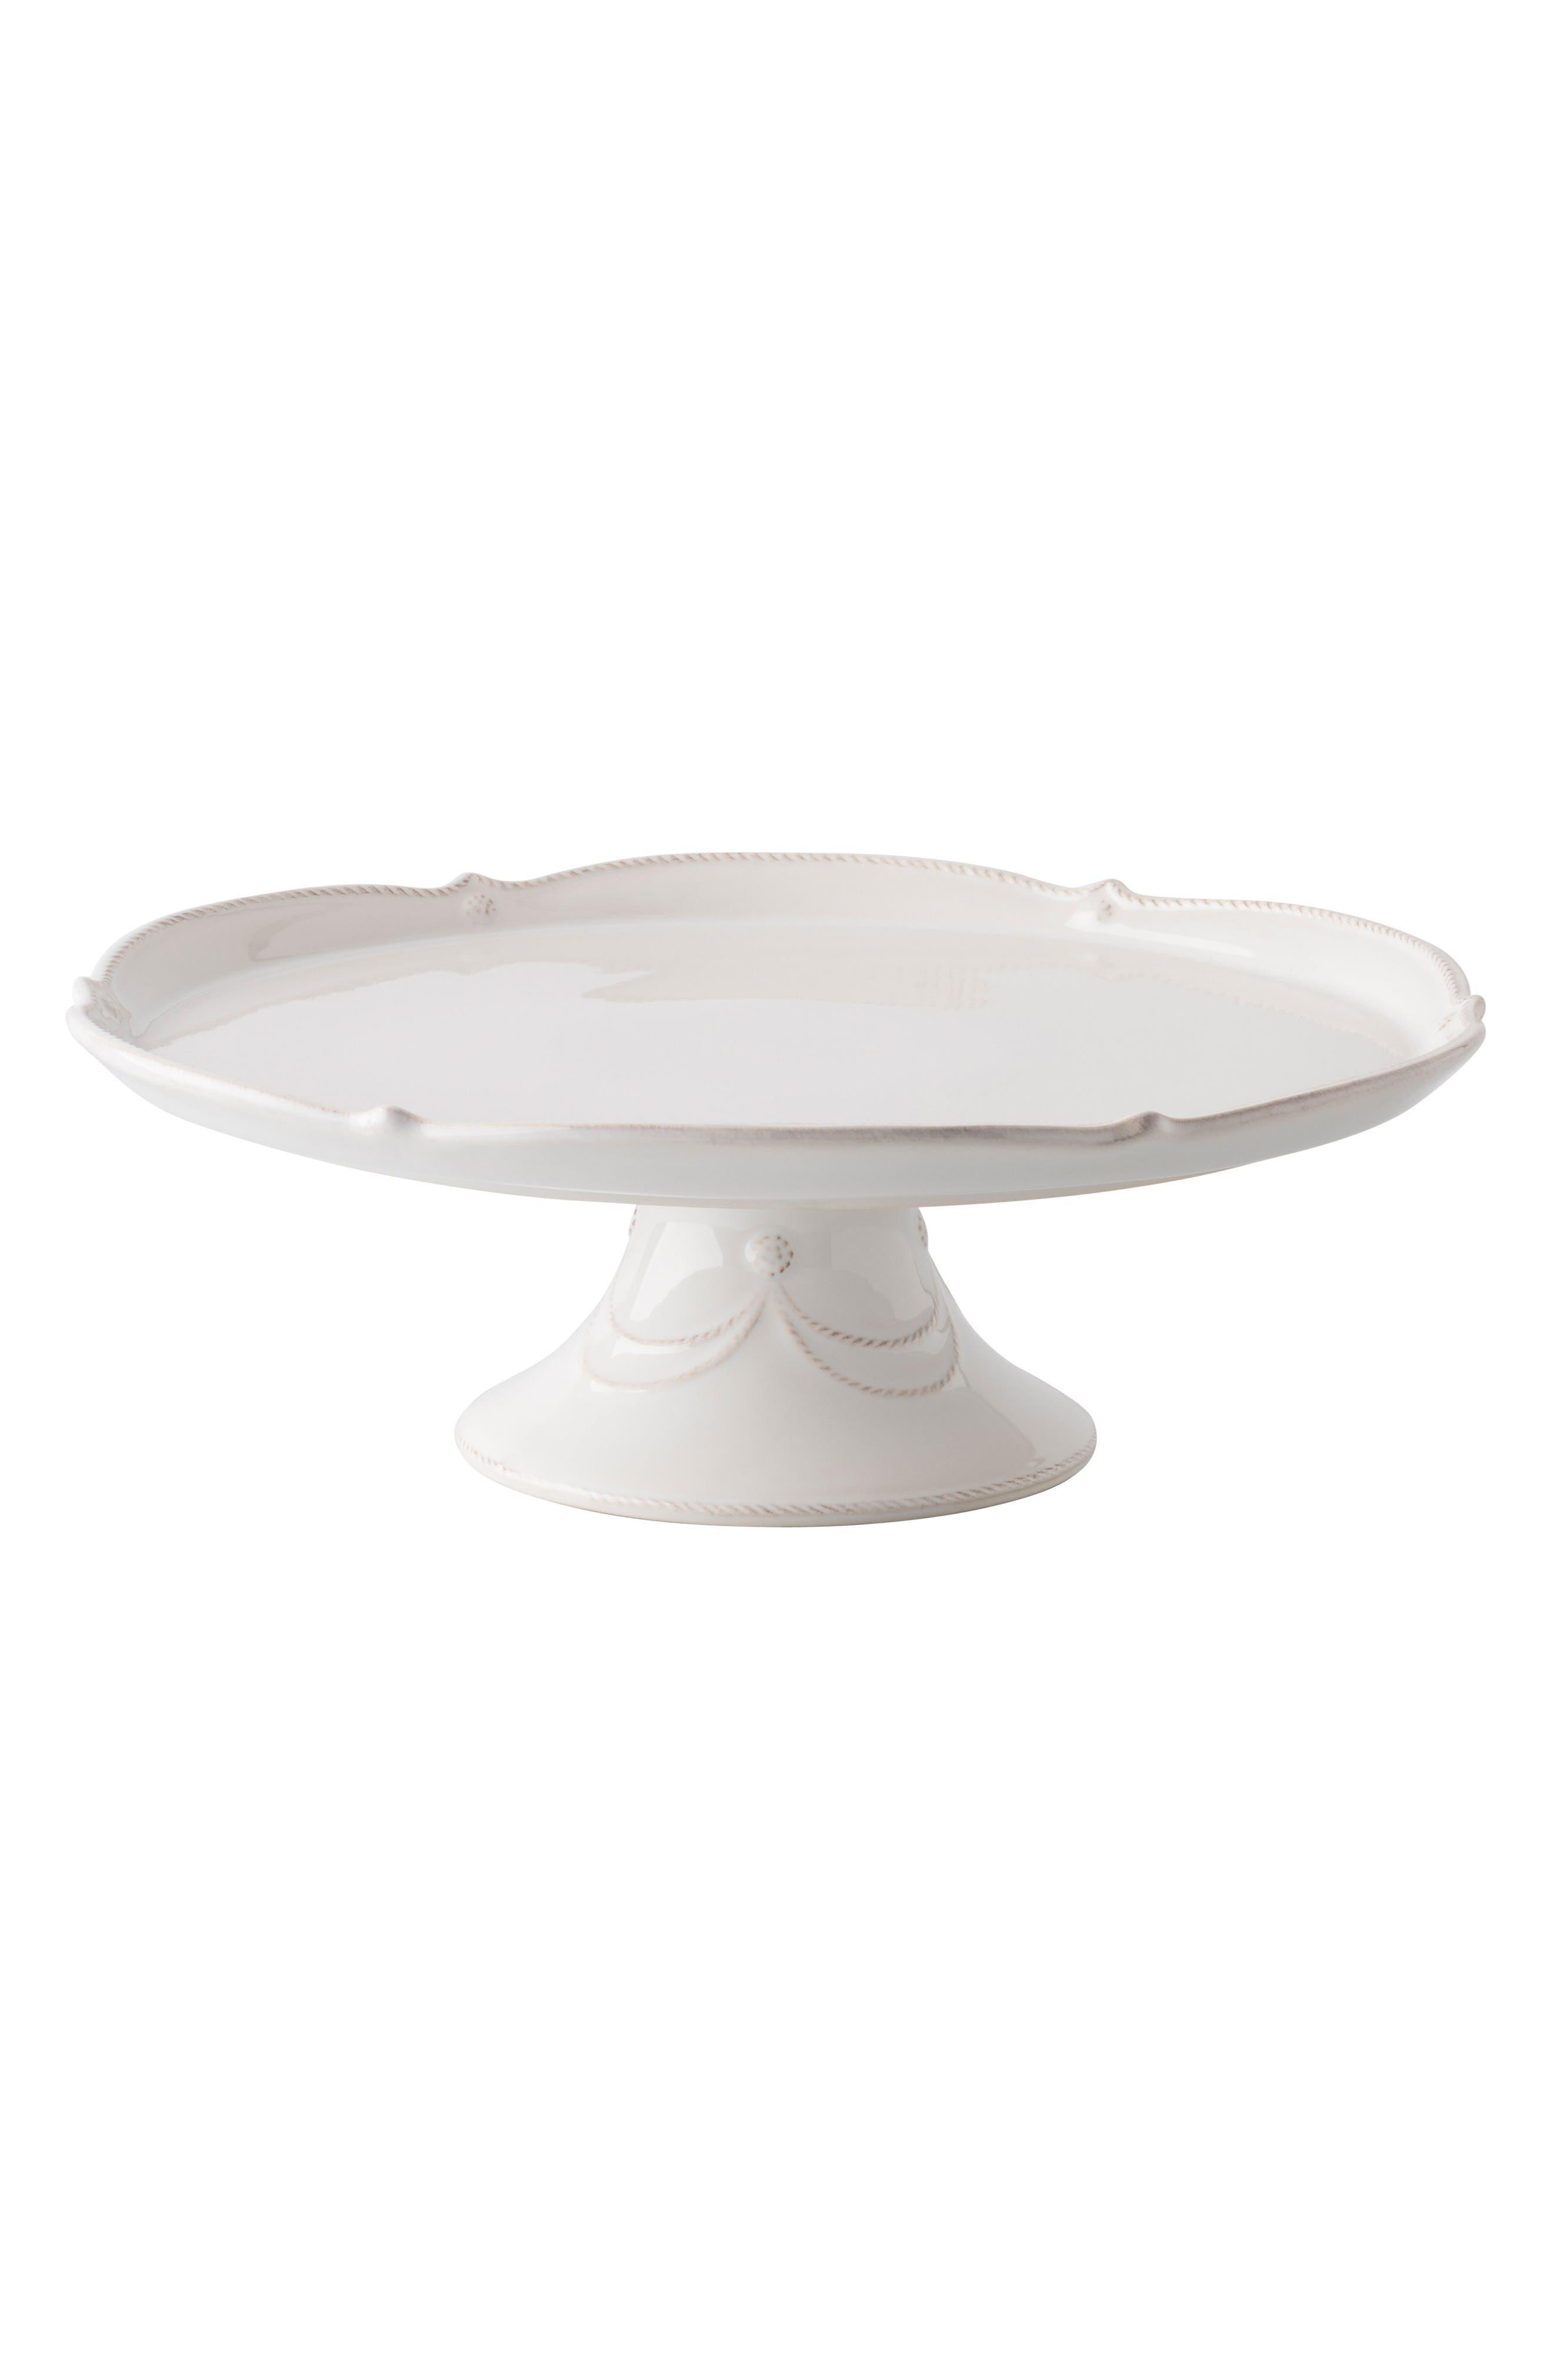 Main Image - Juliska Berry & Thread Ceramic Cake Stand